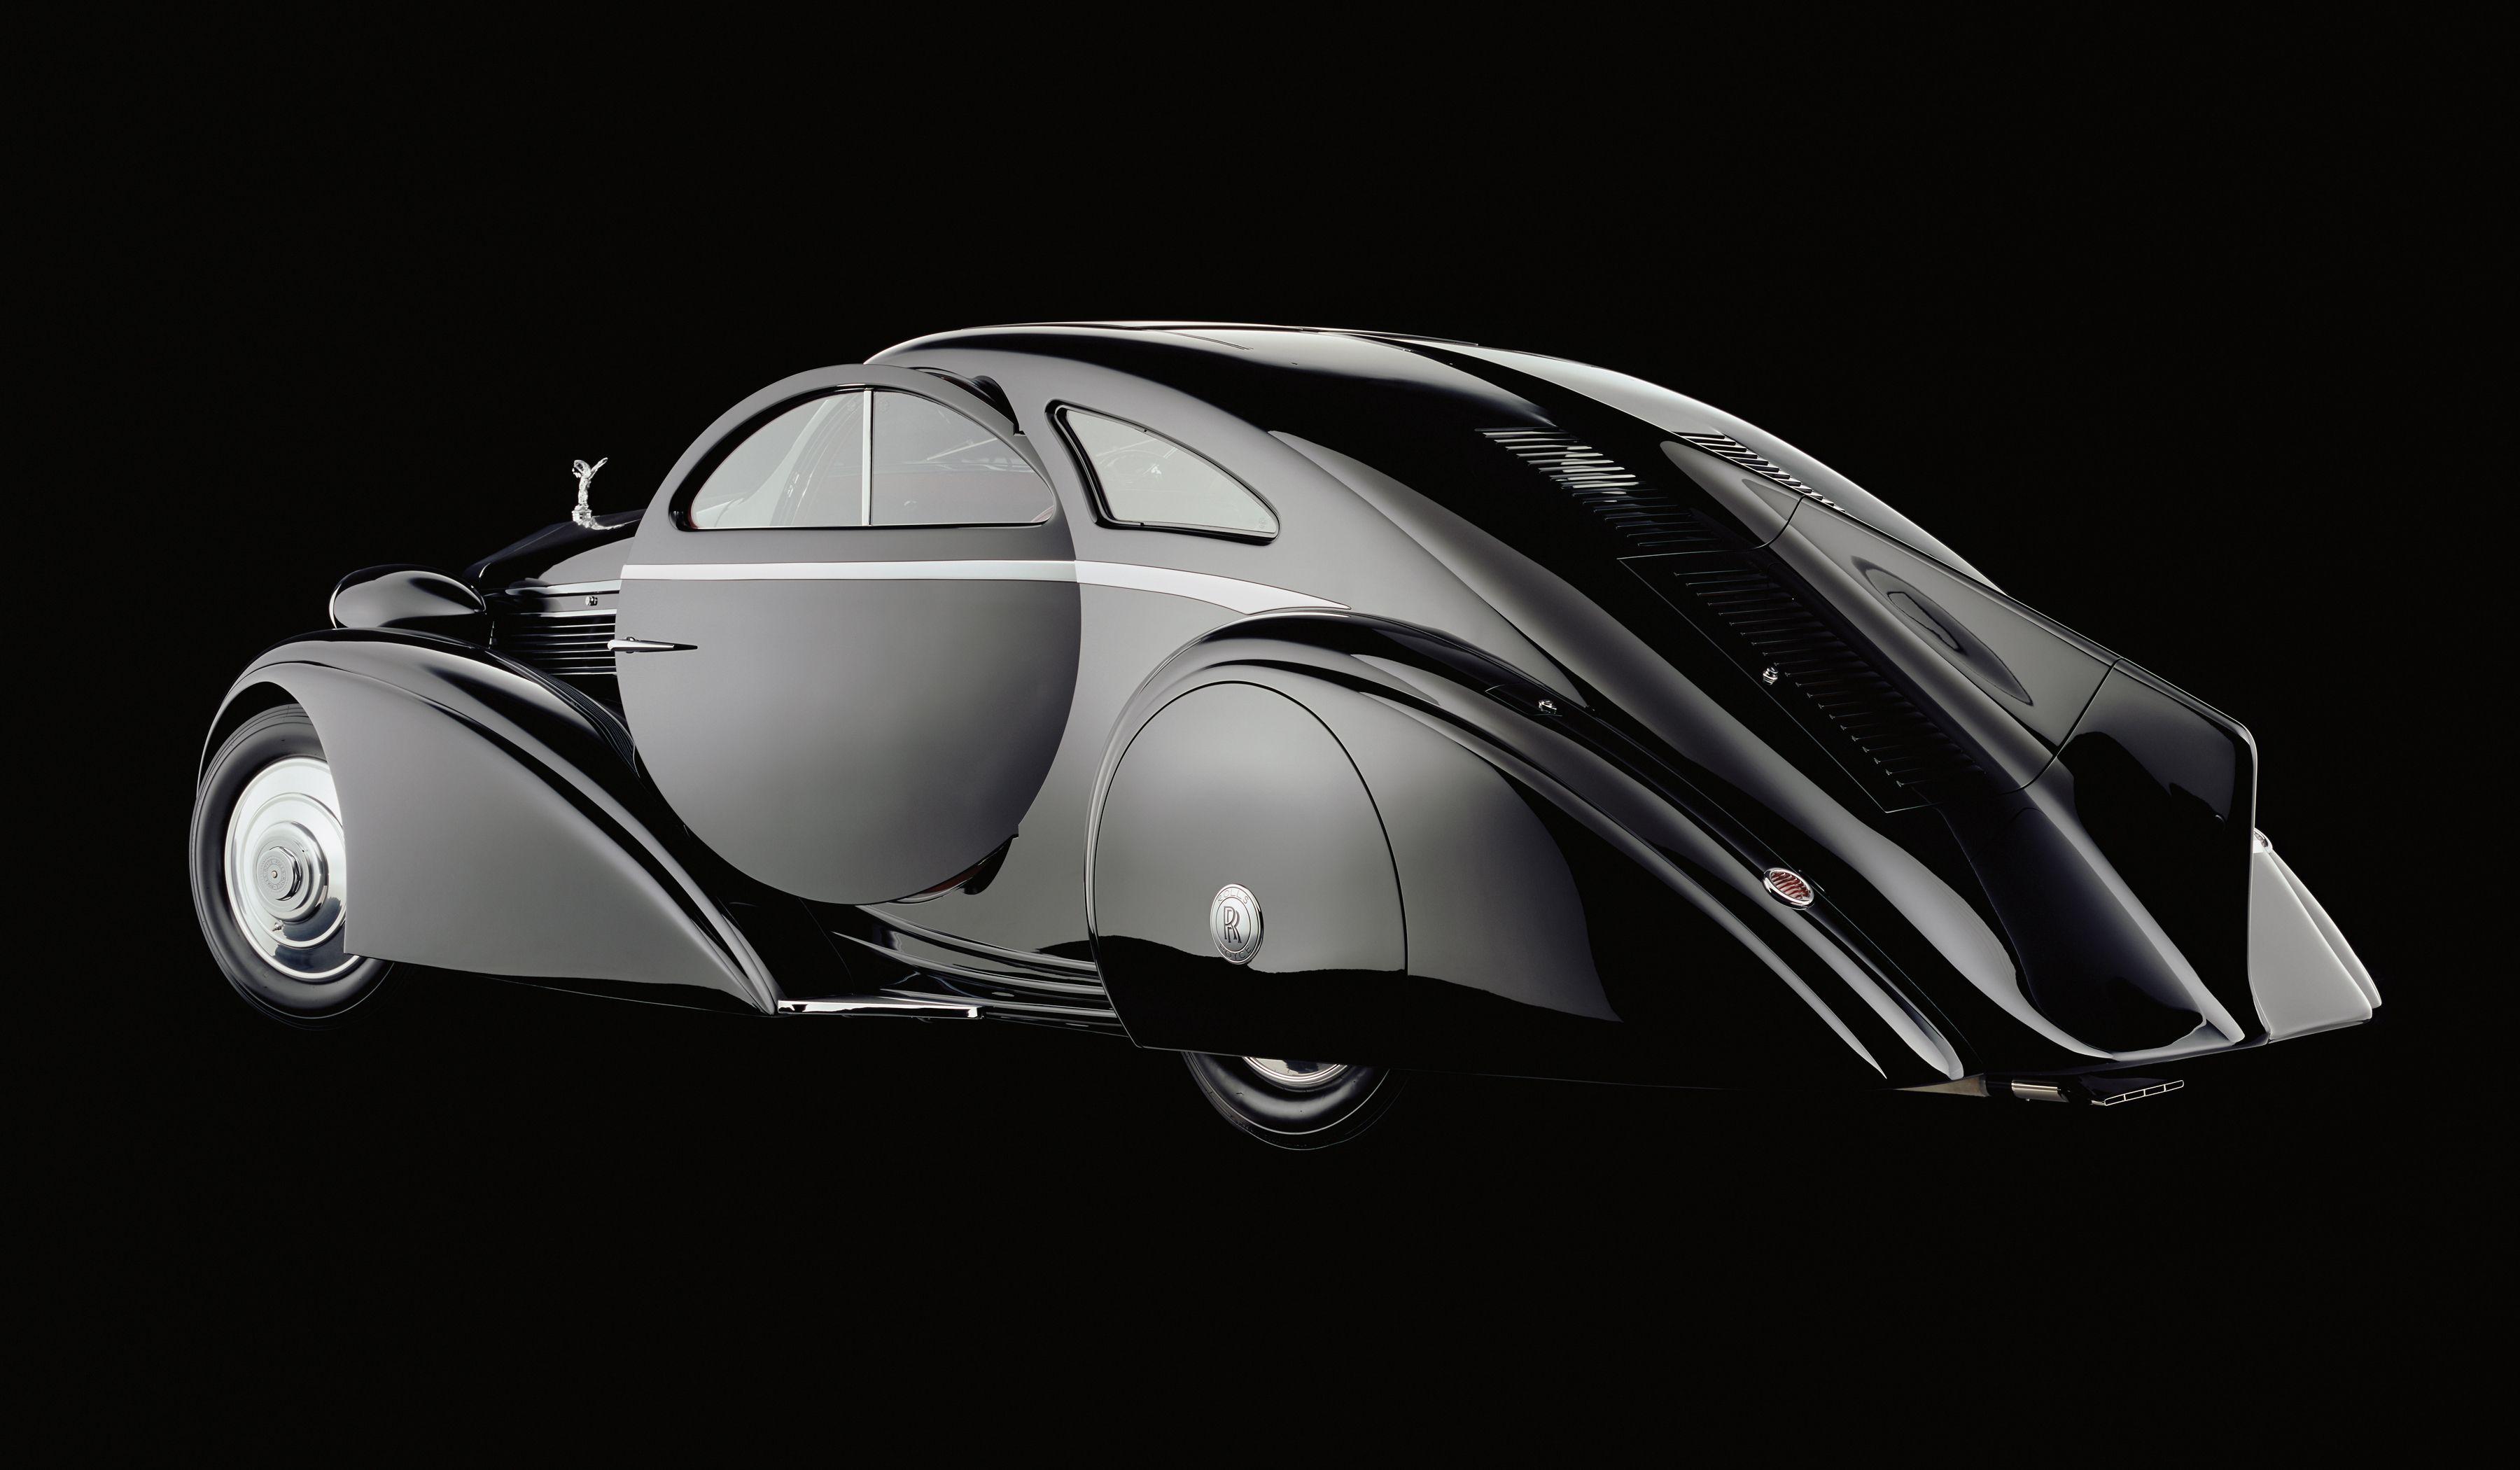 1925 Rolls Royce Phantom >> Phantom 1 Jonckheere Coupe Rear Side View The Round Door